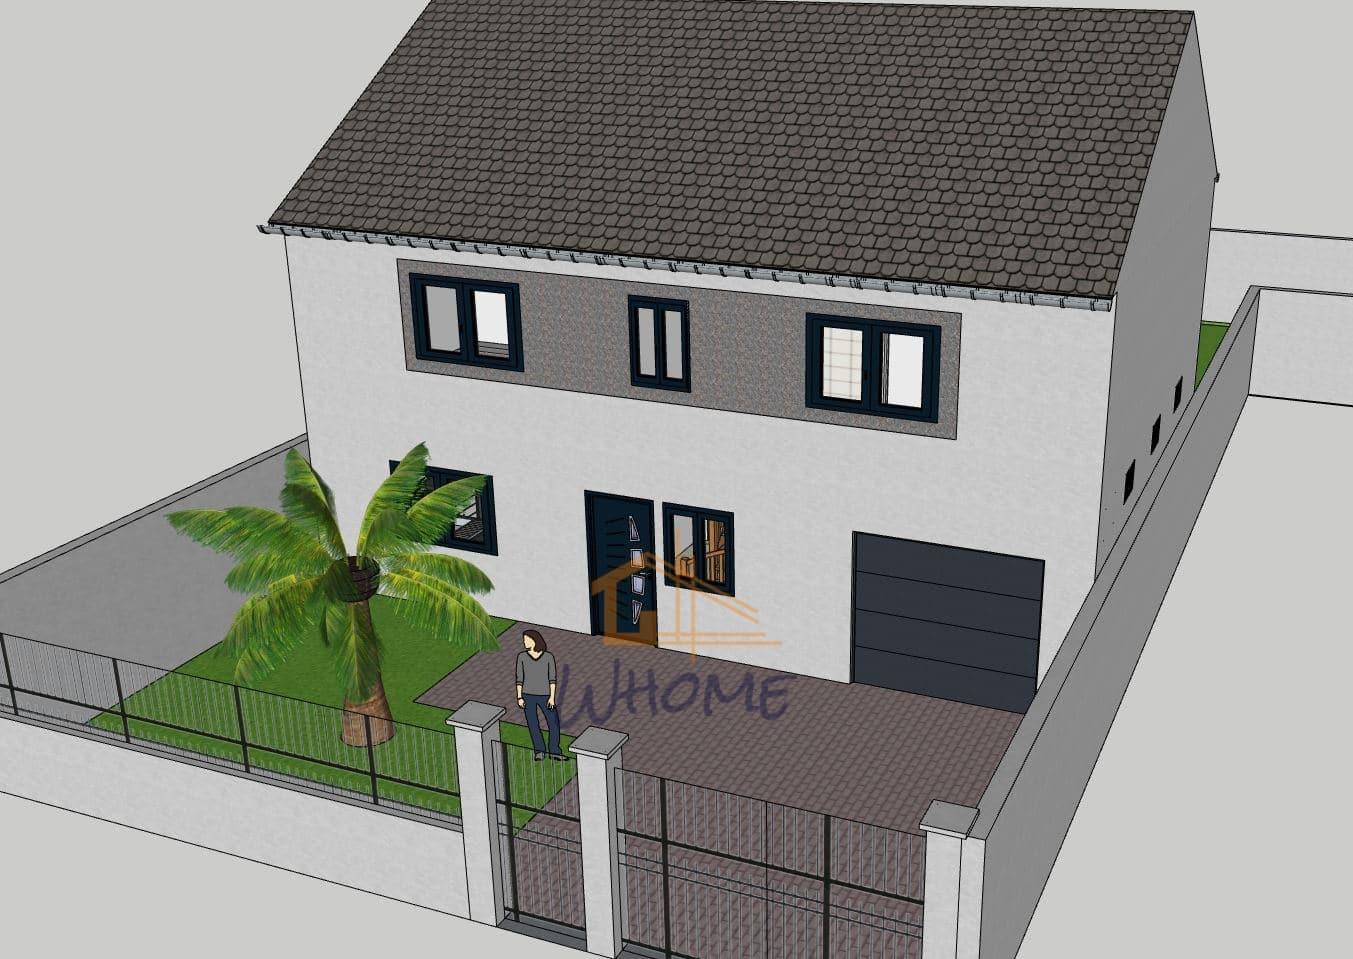 Whome, courtier en travaux - habitation 150m² - Yvelines